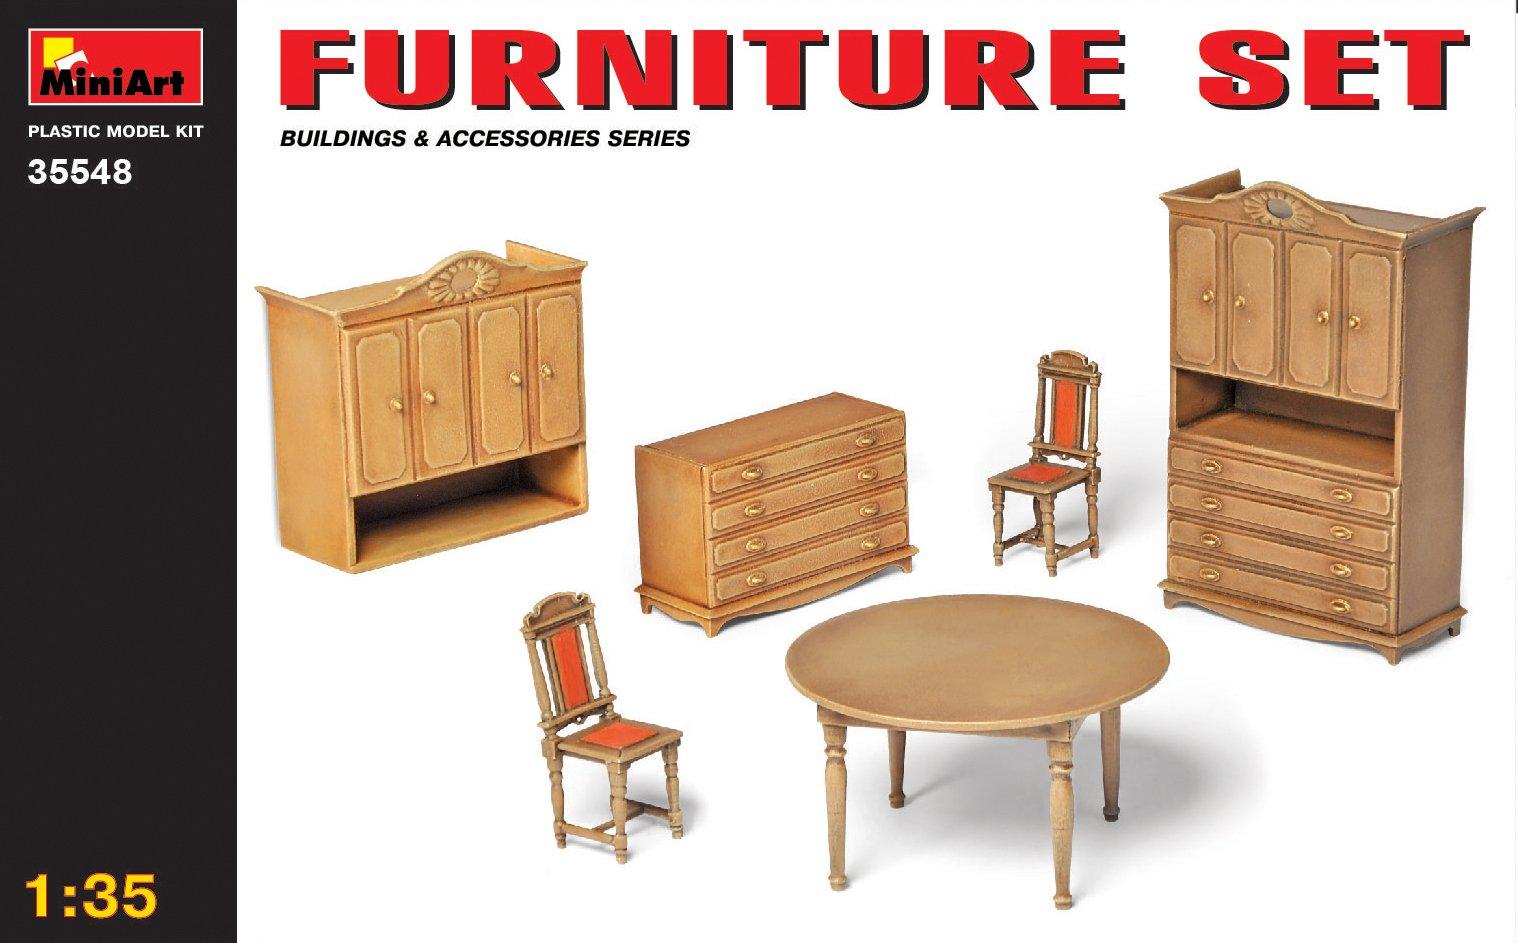 1:35 Furniture Set Model Kit